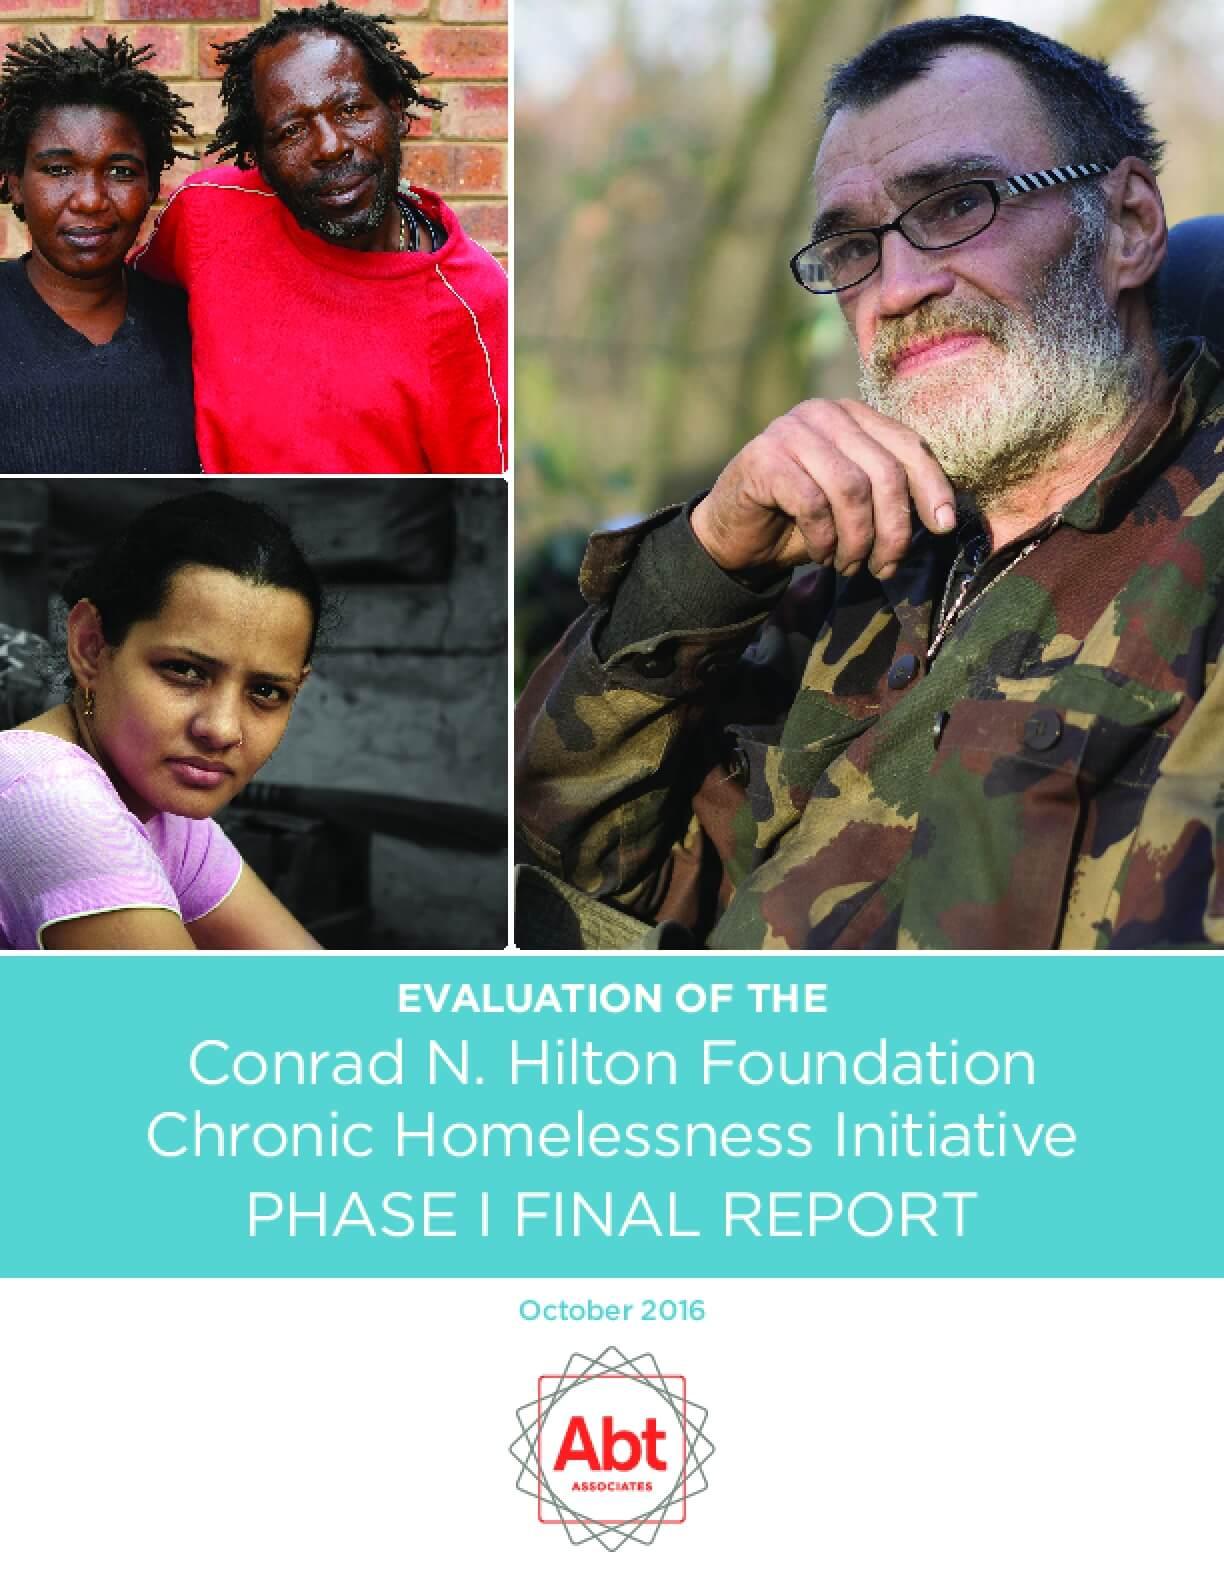 Evaluation of the Conrad N. Hilton Foundation Chronic Homelessness Initiative: 2016 Evaluation Report, Phase I